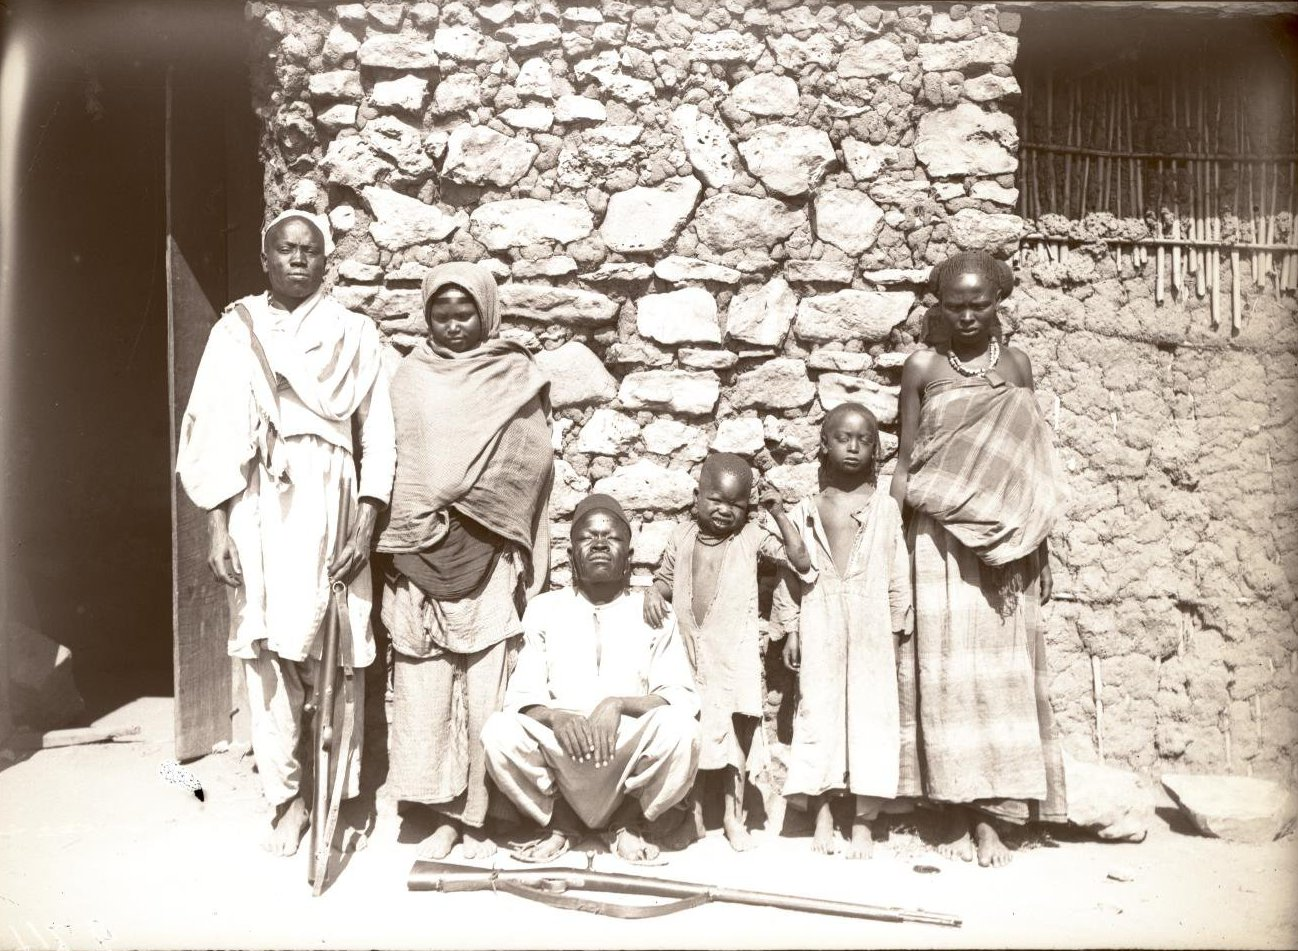 274. Абиссиния, провинция Харар, г. Харар. Солдат-шанкала с семьёй